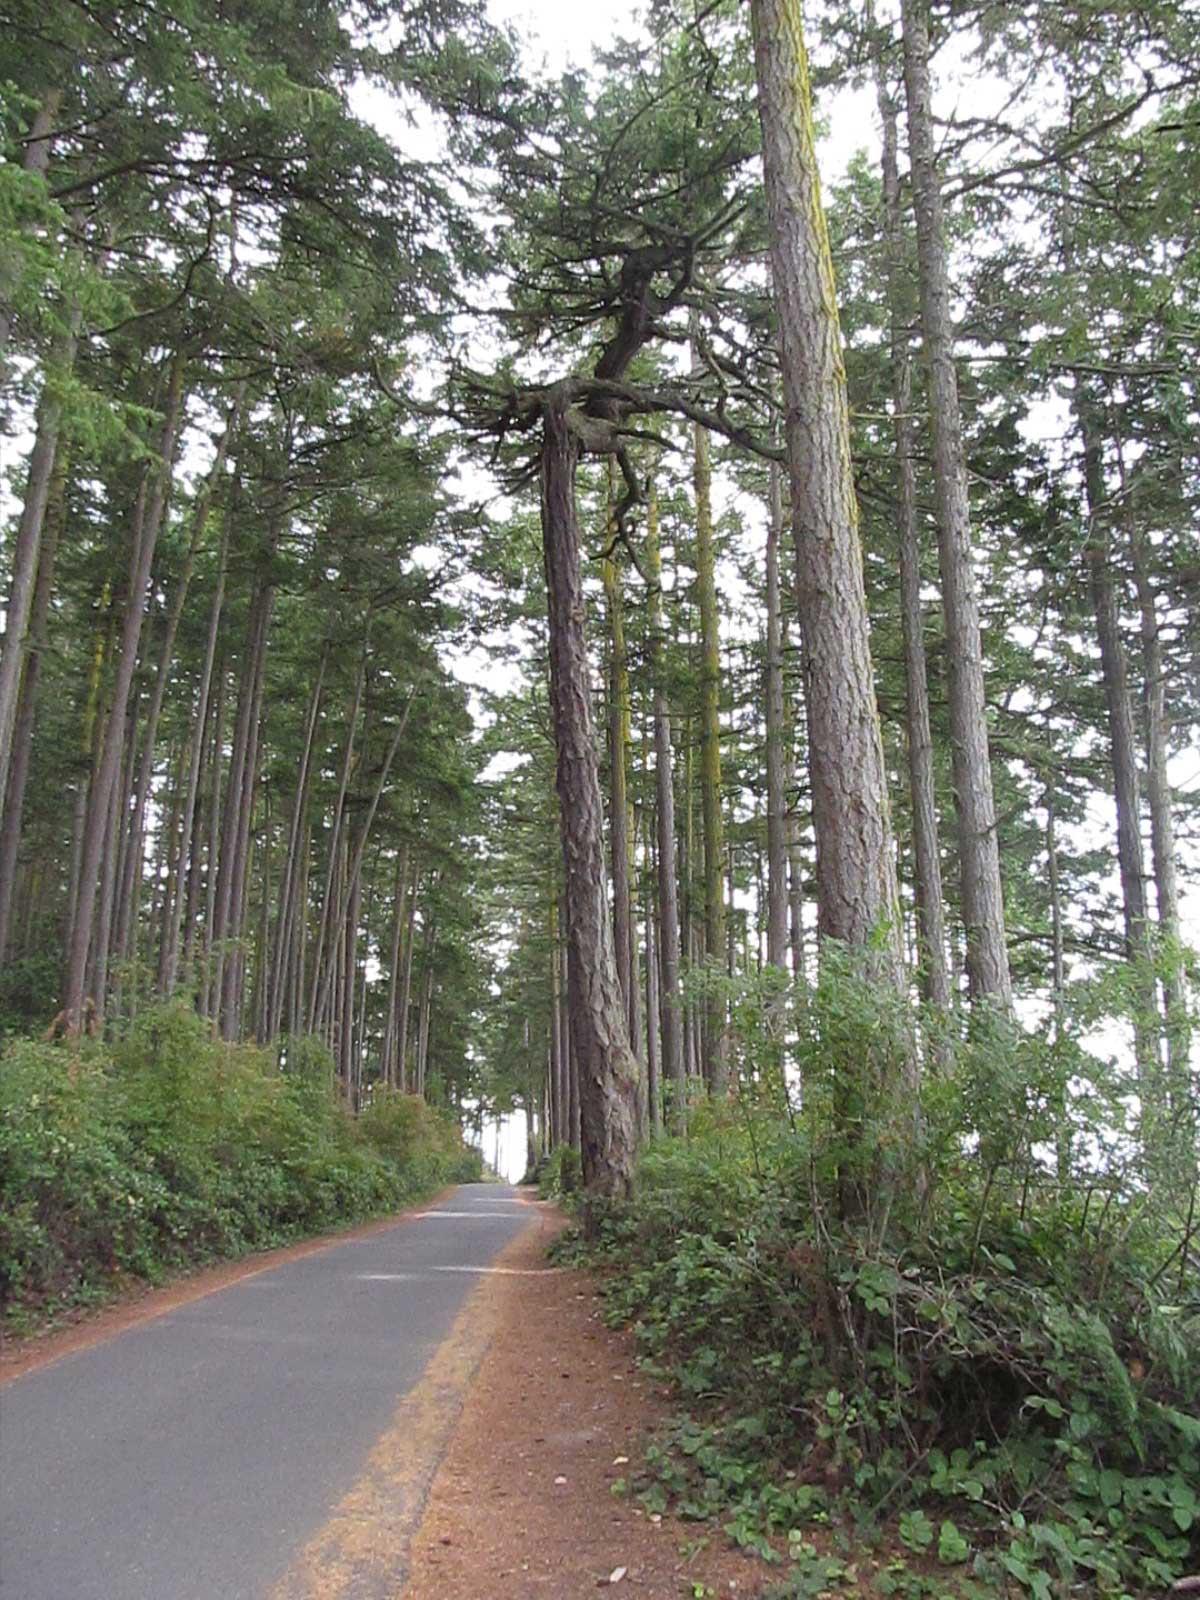 Tree Lined Road in Washington